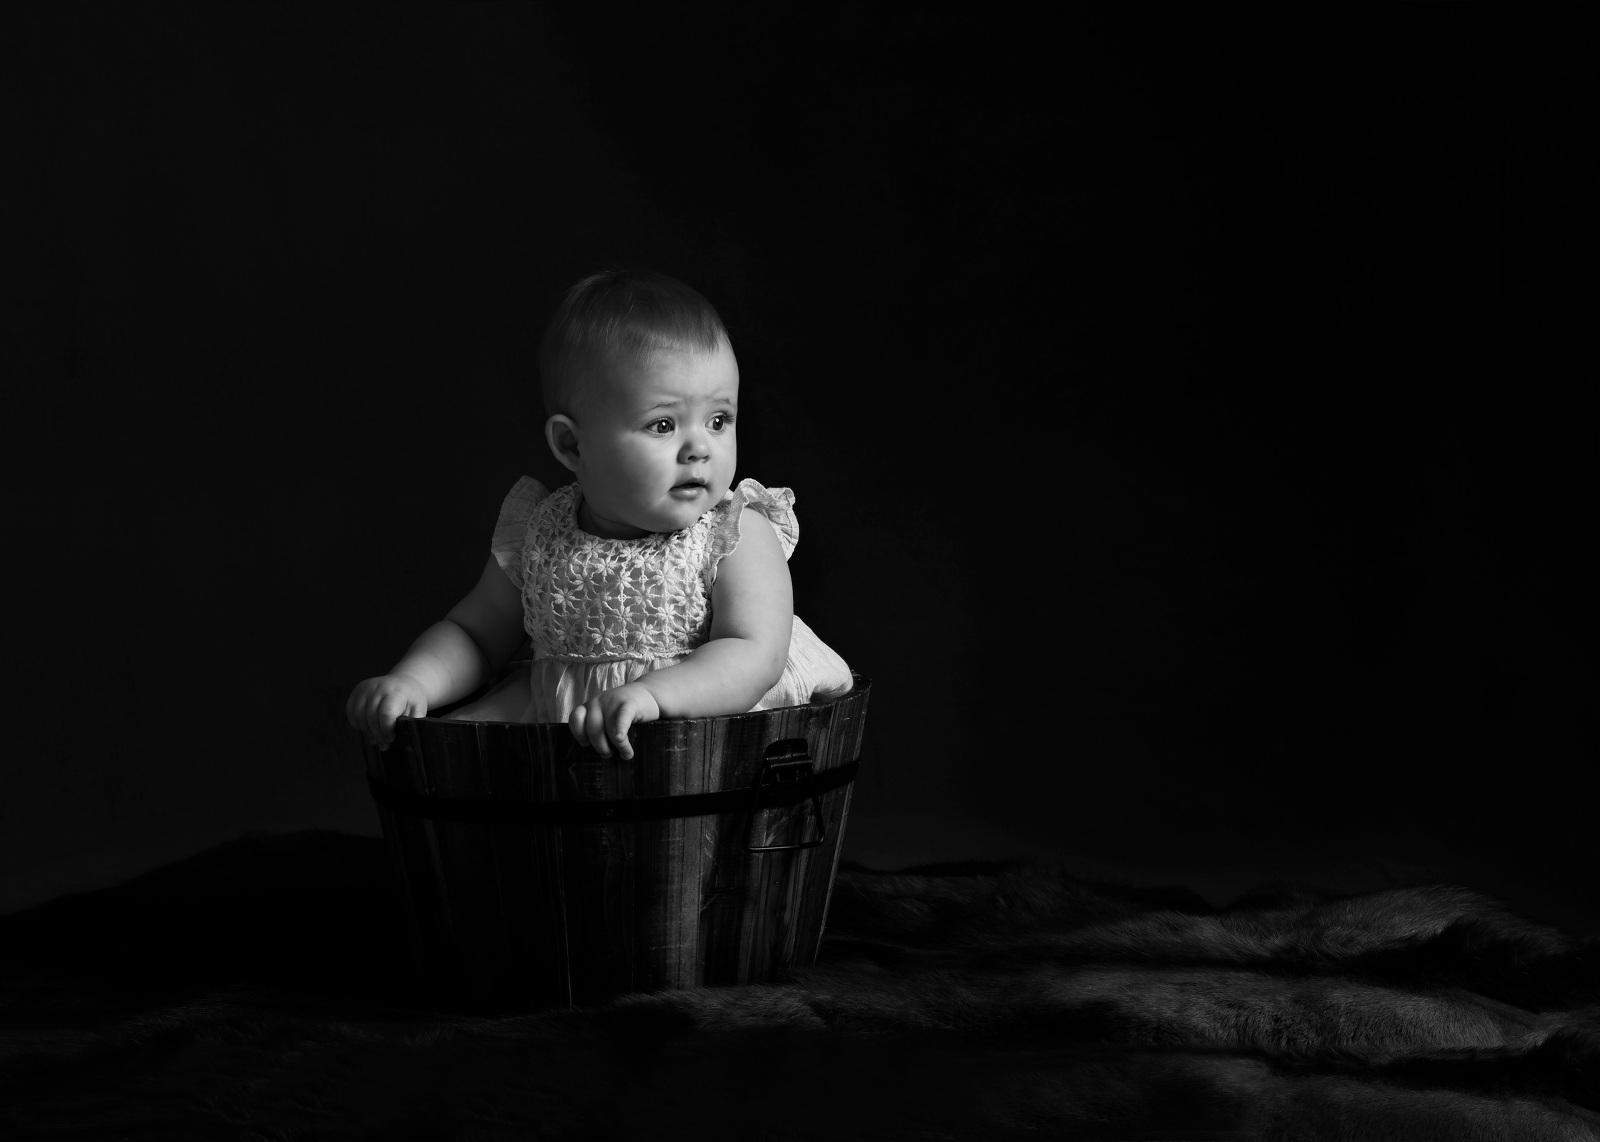 barnfoto, barnfotografering, studiofotograf, terri lindholm, lindholm photography